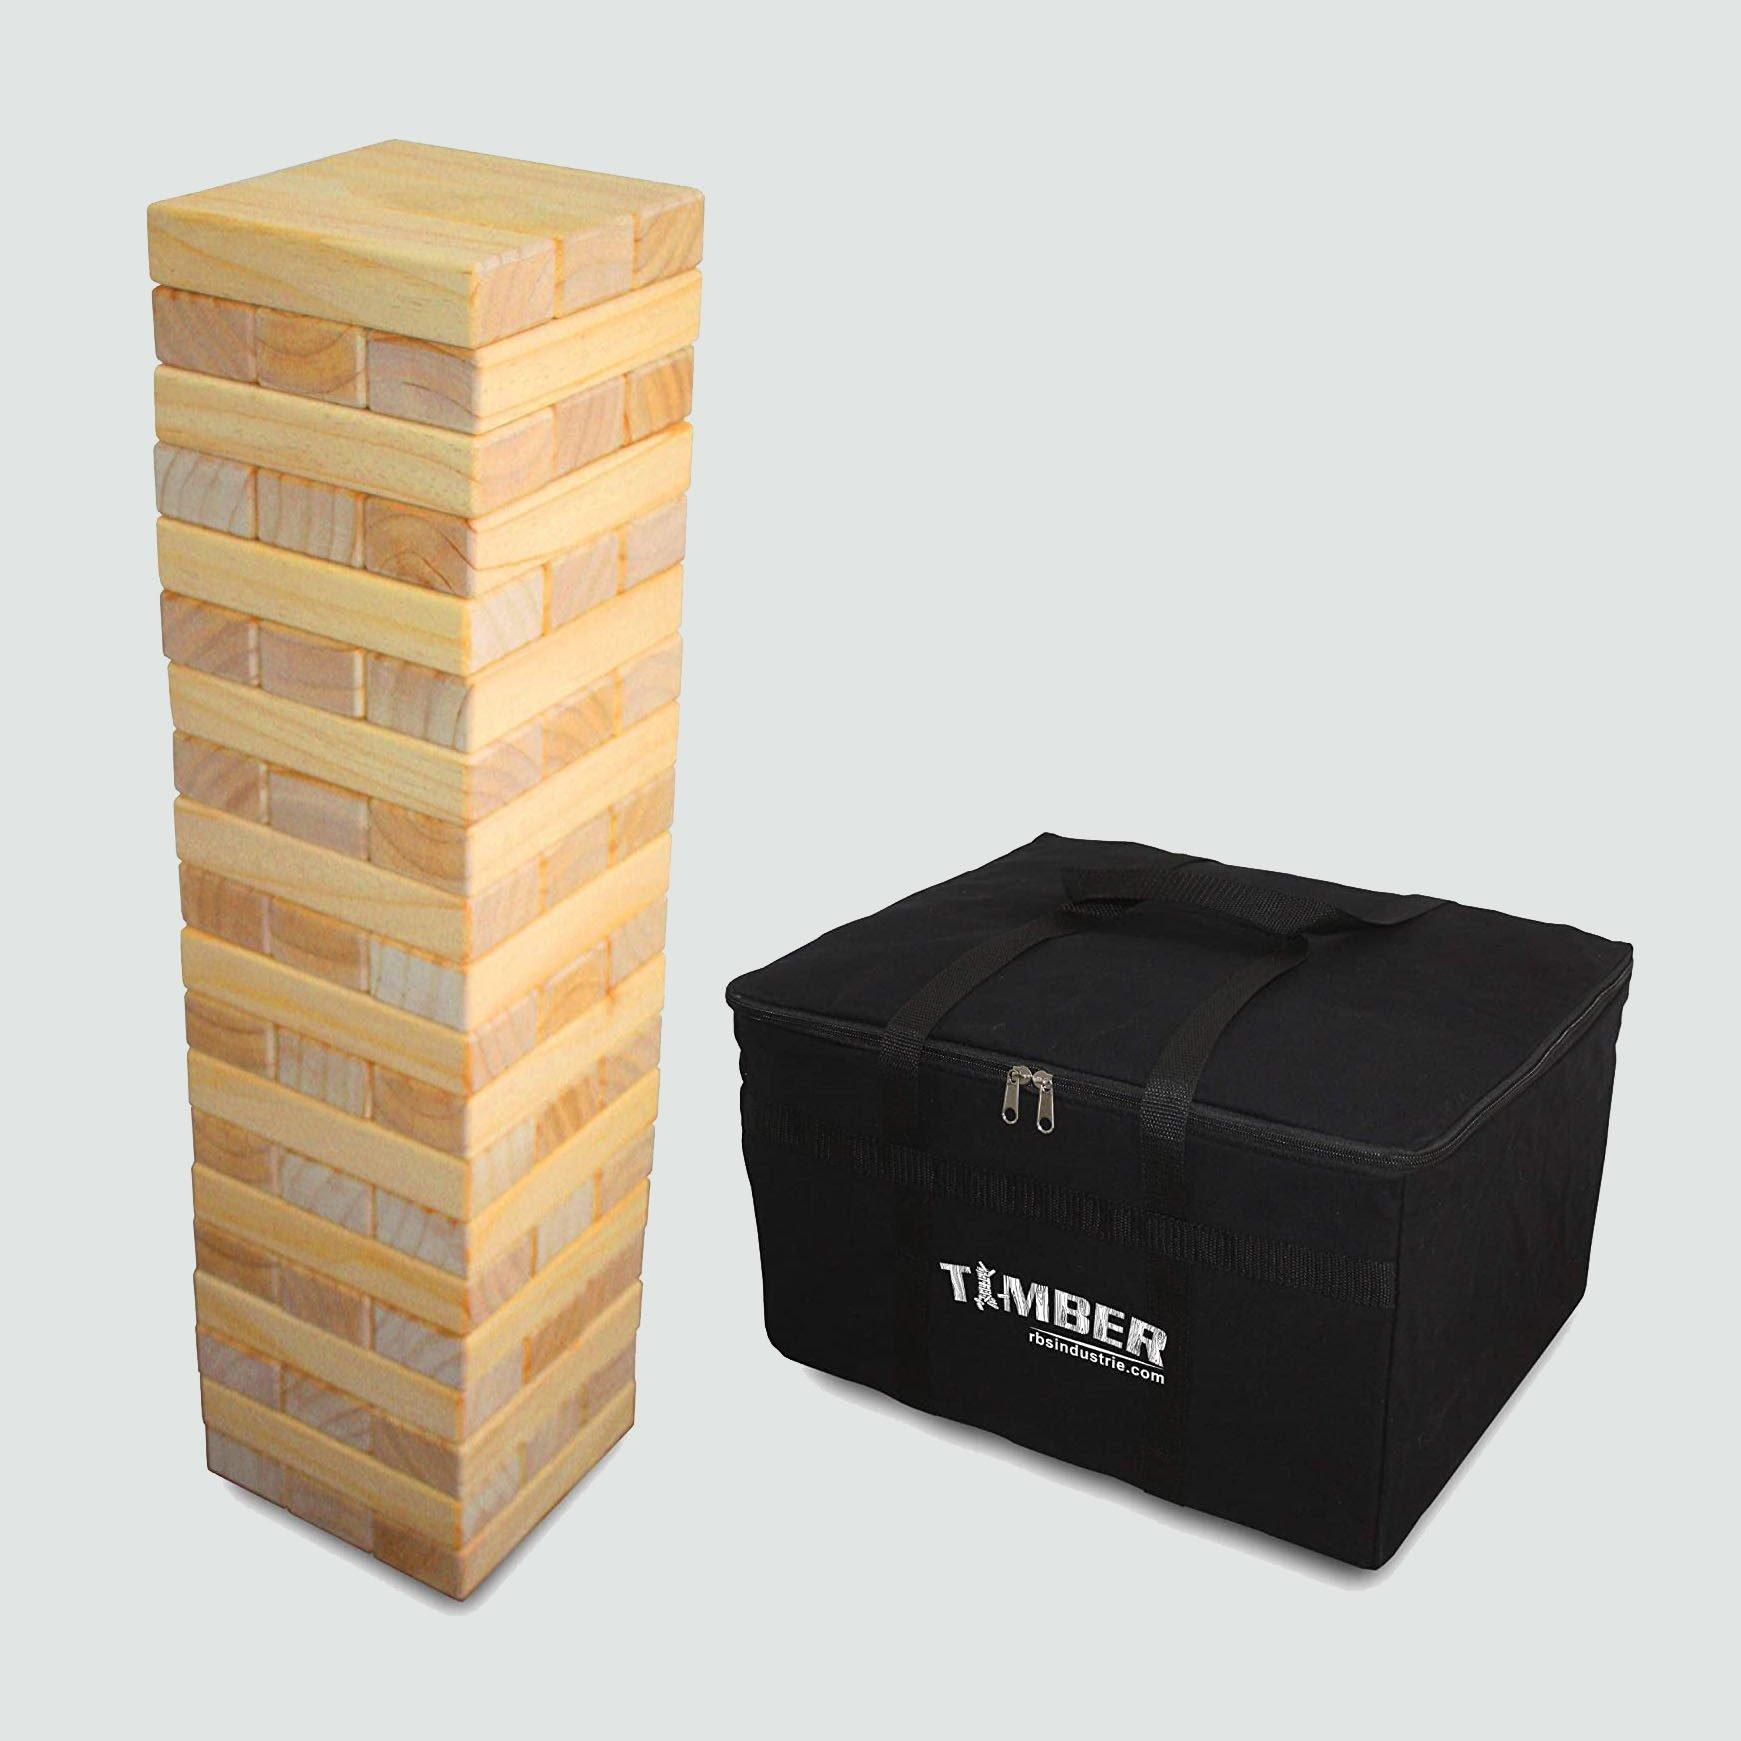 Giant Timber - Jumbo Size Wood Game